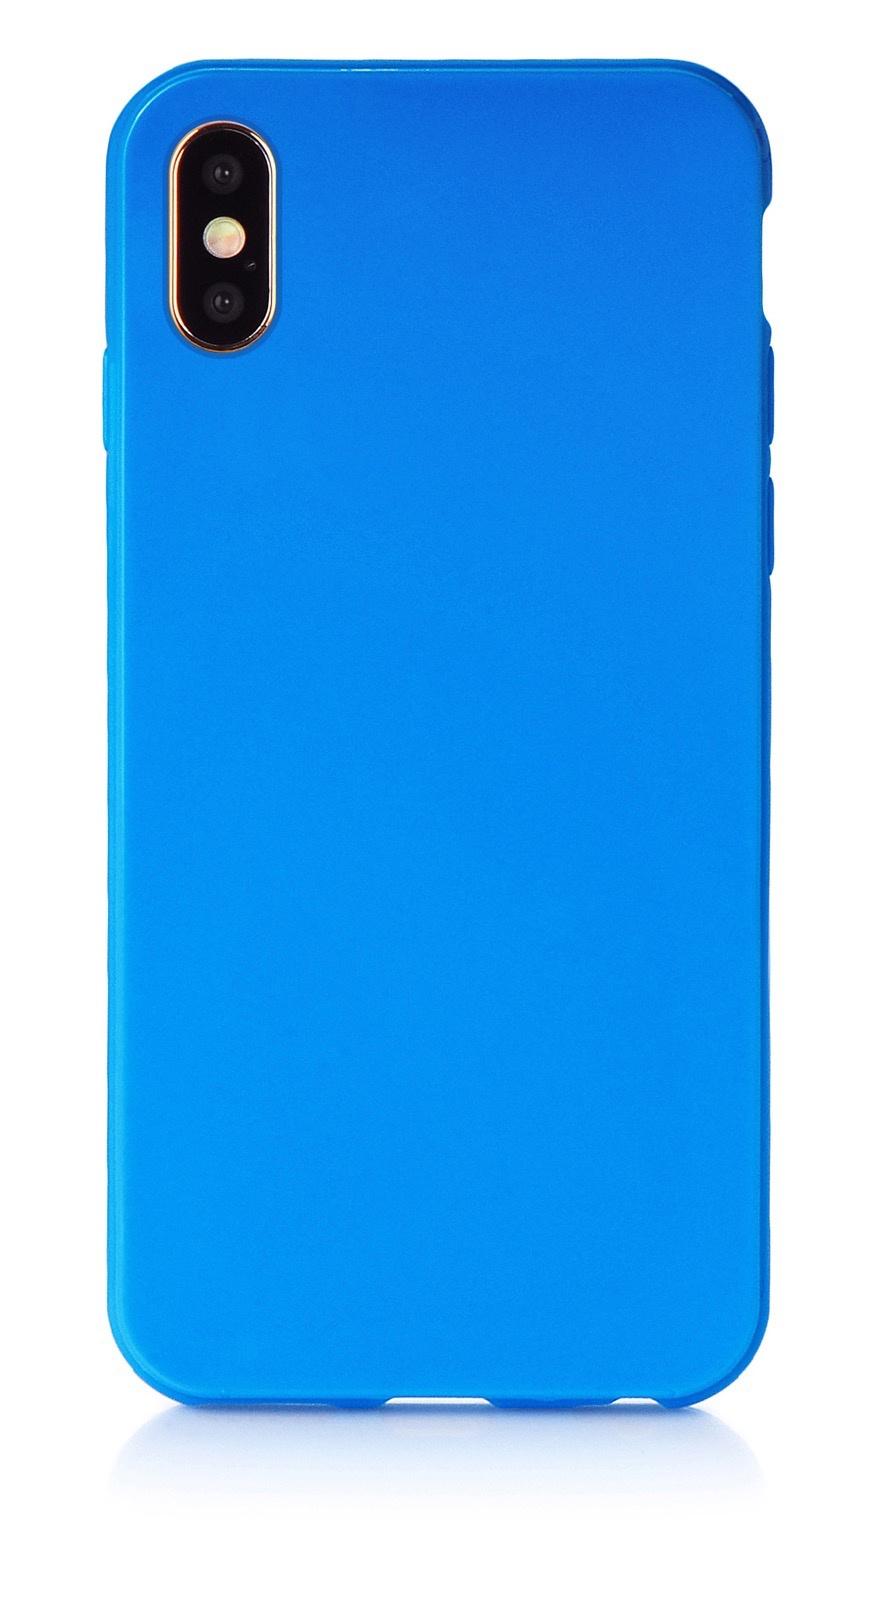 "Чехол для сотового телефона iNeez накладка силикон мыльница 907282 для Apple Iphone XS Max 6.5"", синий"